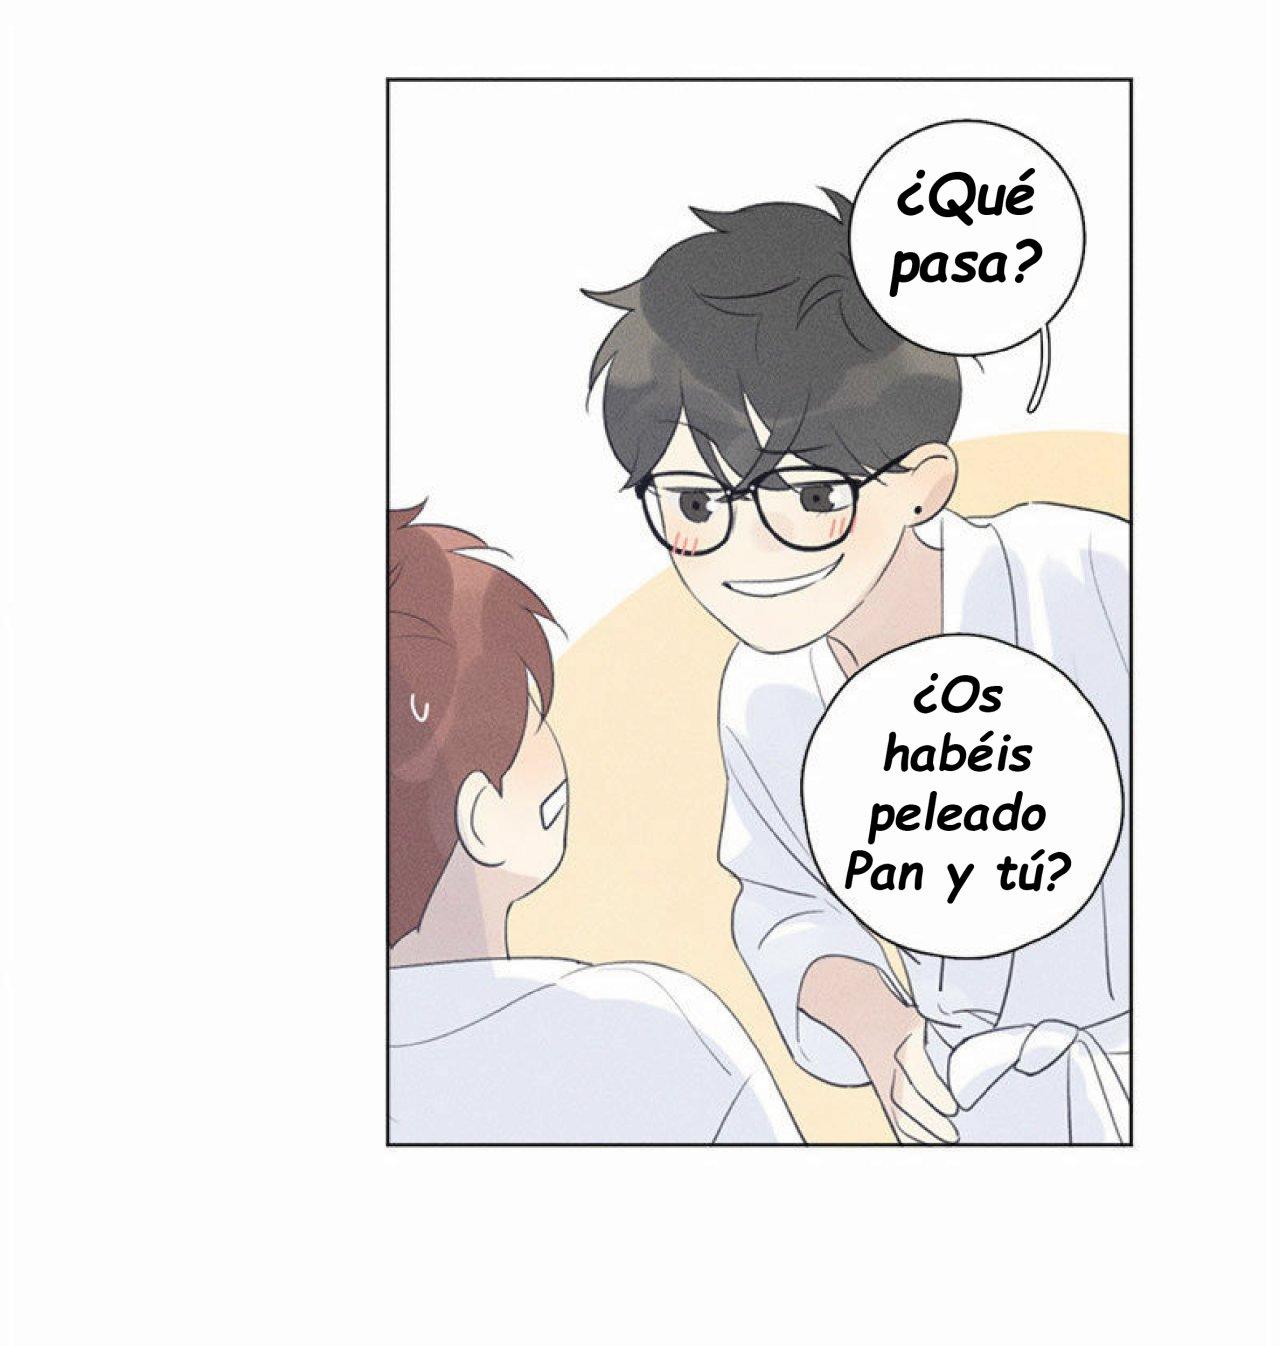 https://nine.mangadogs.com/es_manga/pic8/29/24925/946329/7e759acddd50cda00648a26476897b21.jpg Page 37